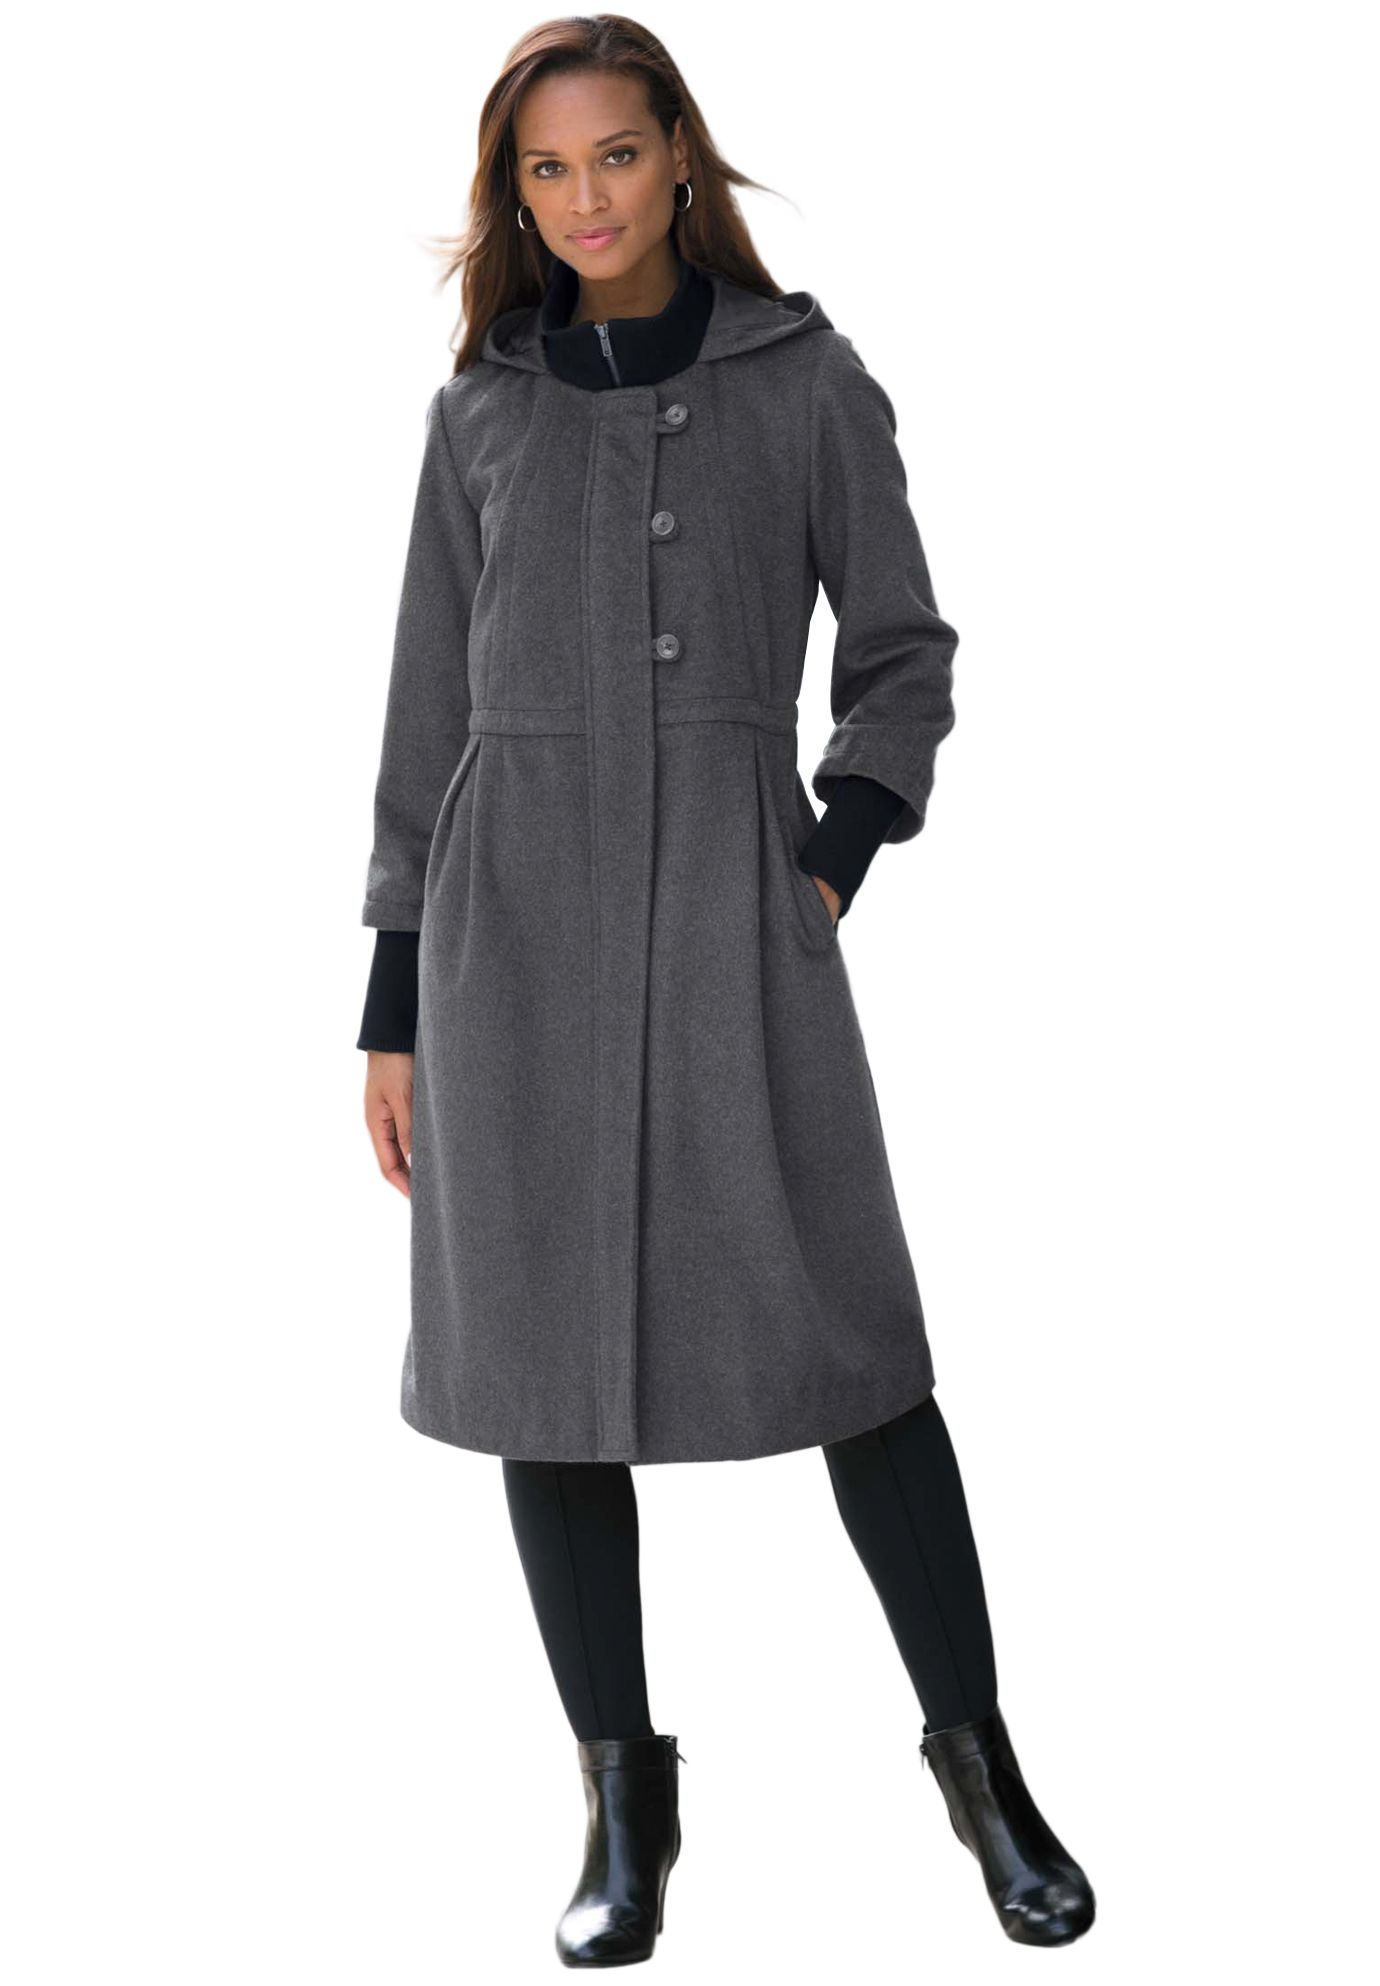 Wool-Blend Coat With Empire Waist | Plus Size Long Coats ...